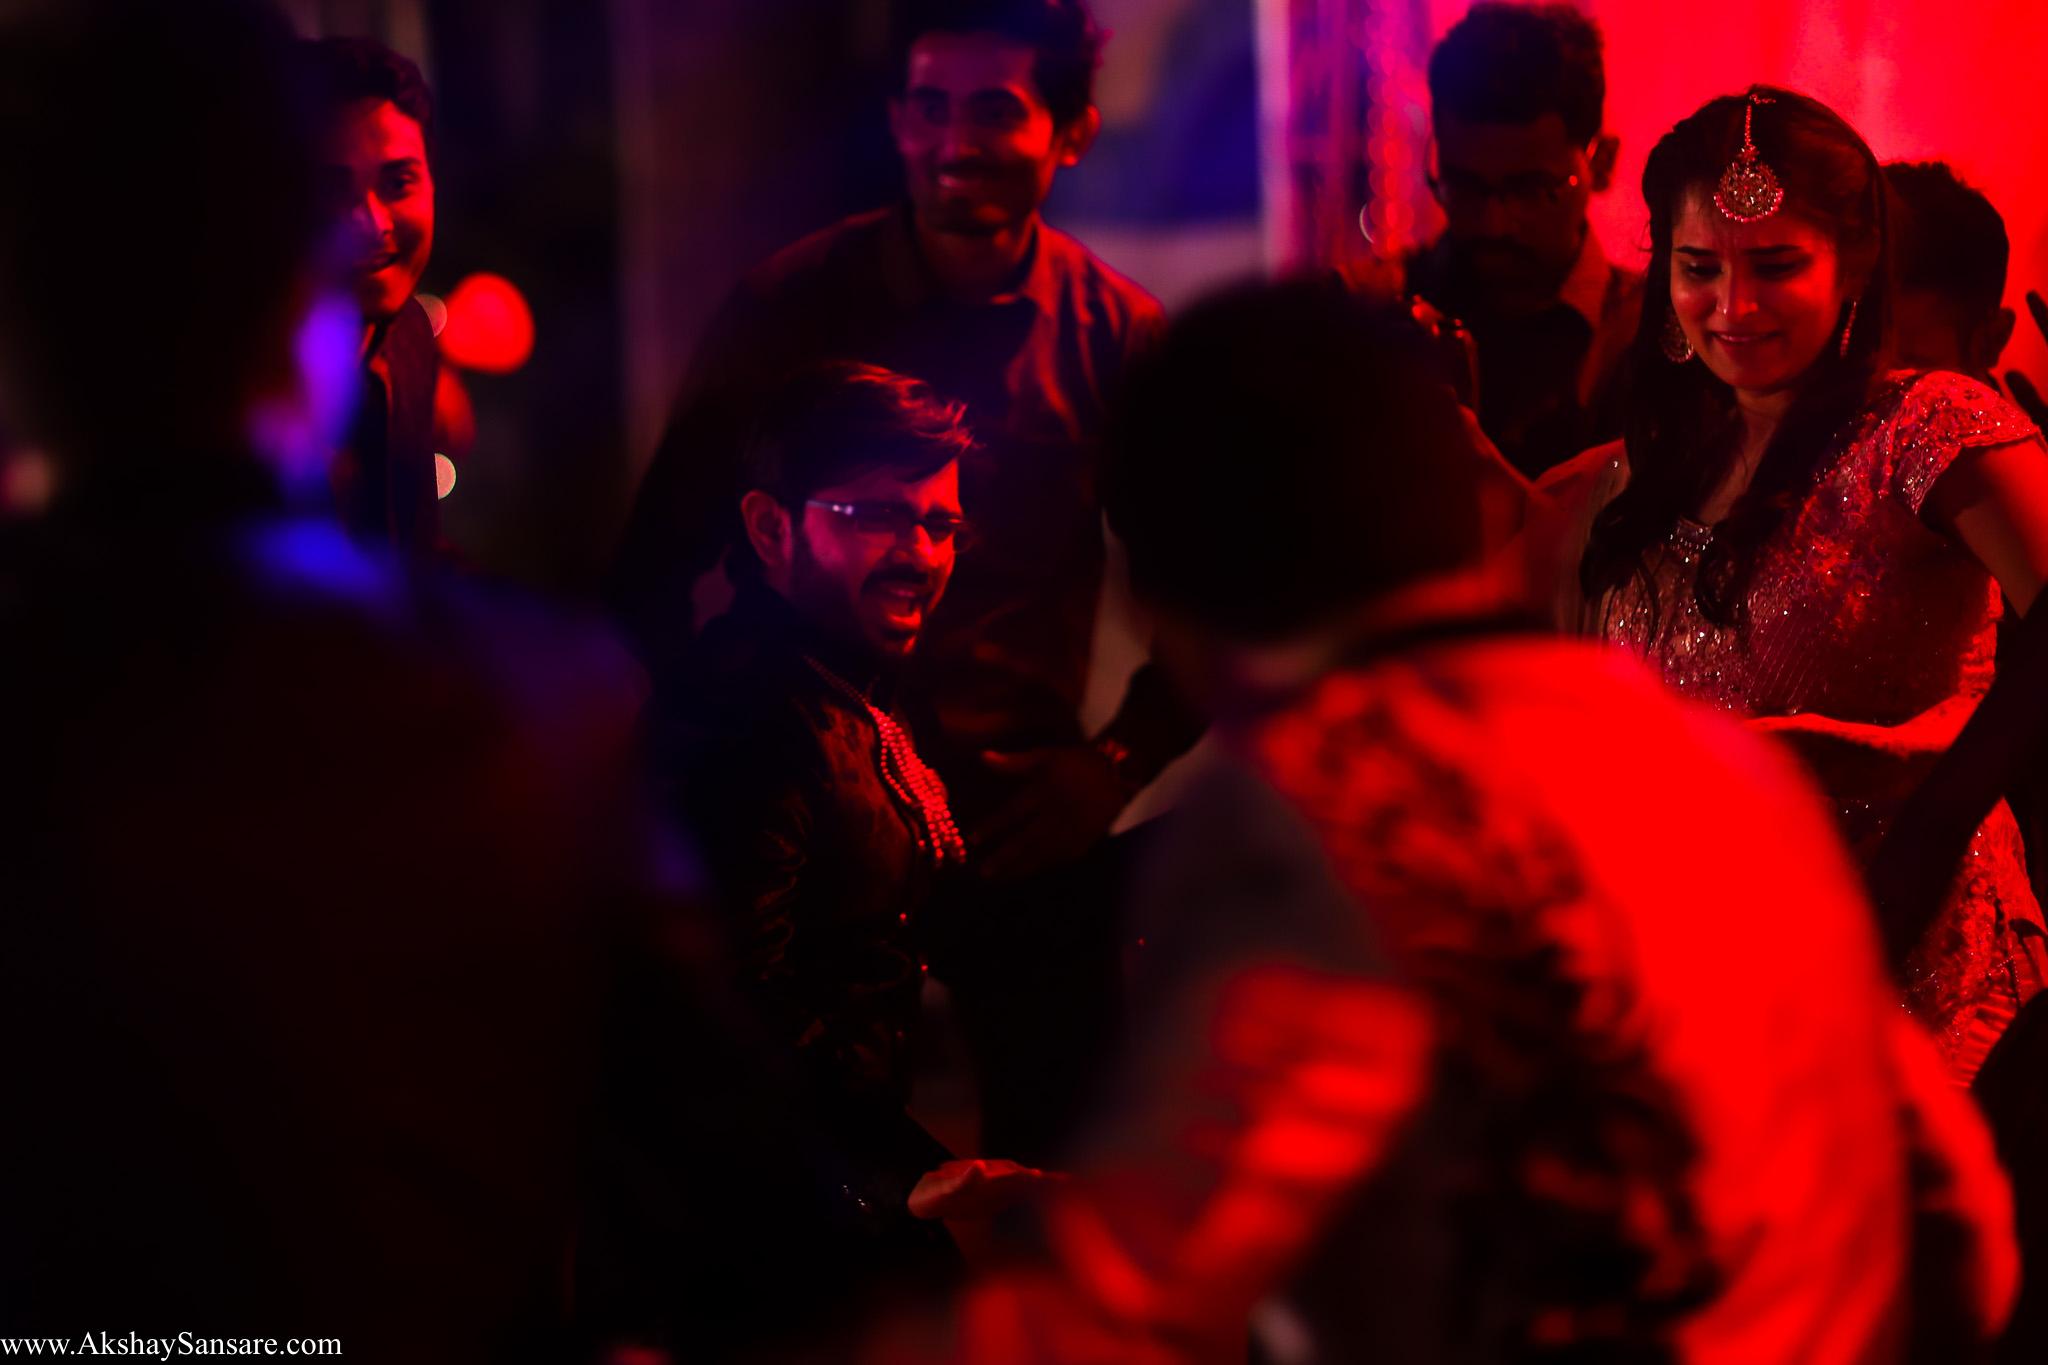 Akshay Sansare Photography Kunal x Shrutika best candid photographers in mumbai(19).jpg